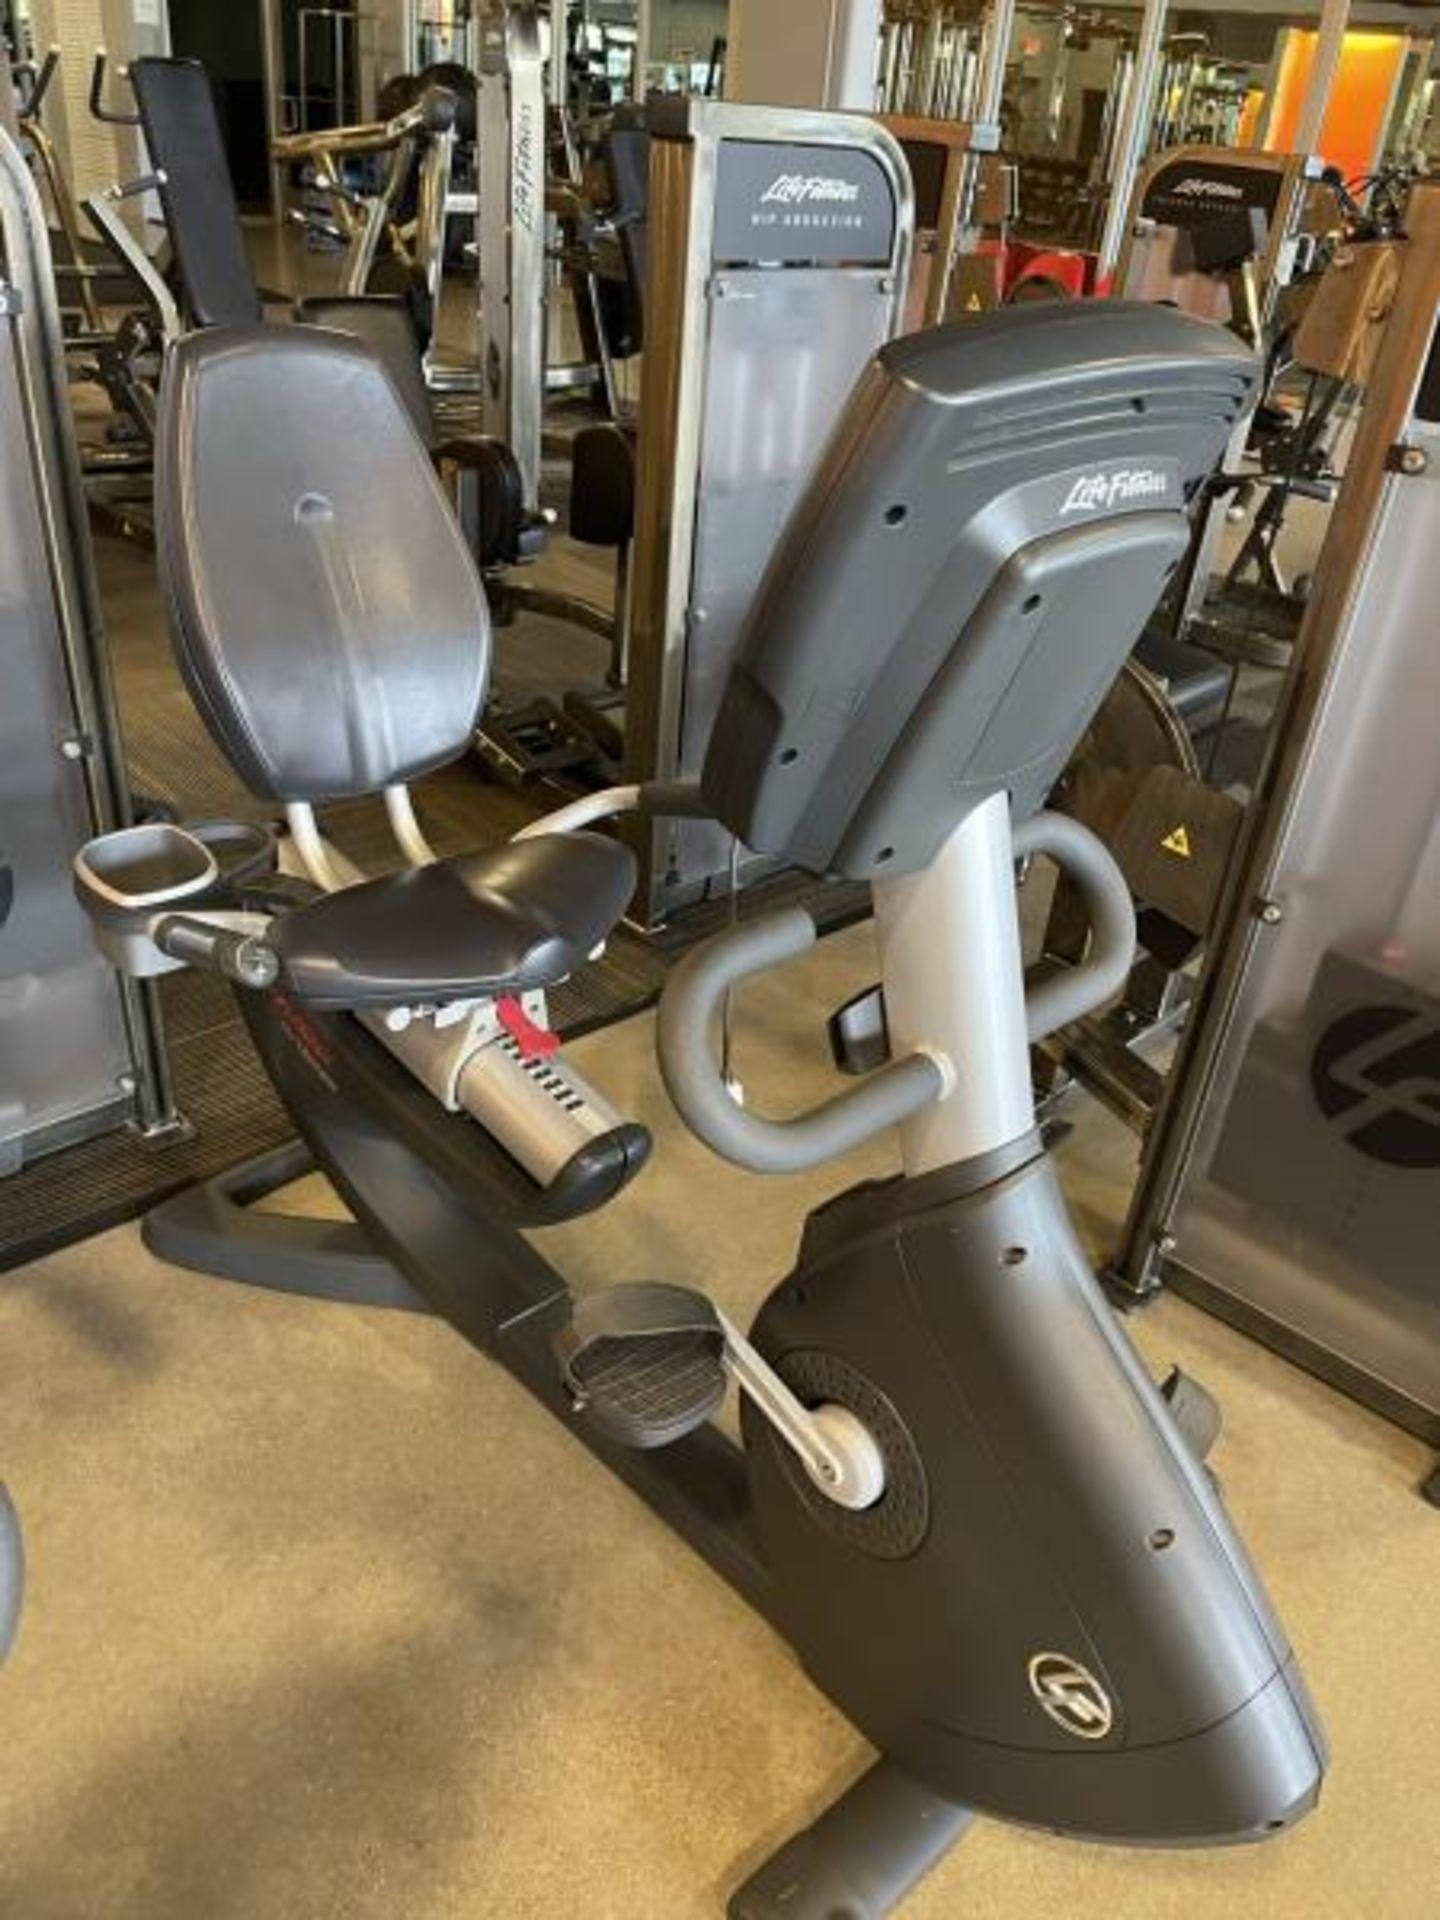 Life Fitness Lifecycle Recumbent Bike M: 95R - Image 2 of 5